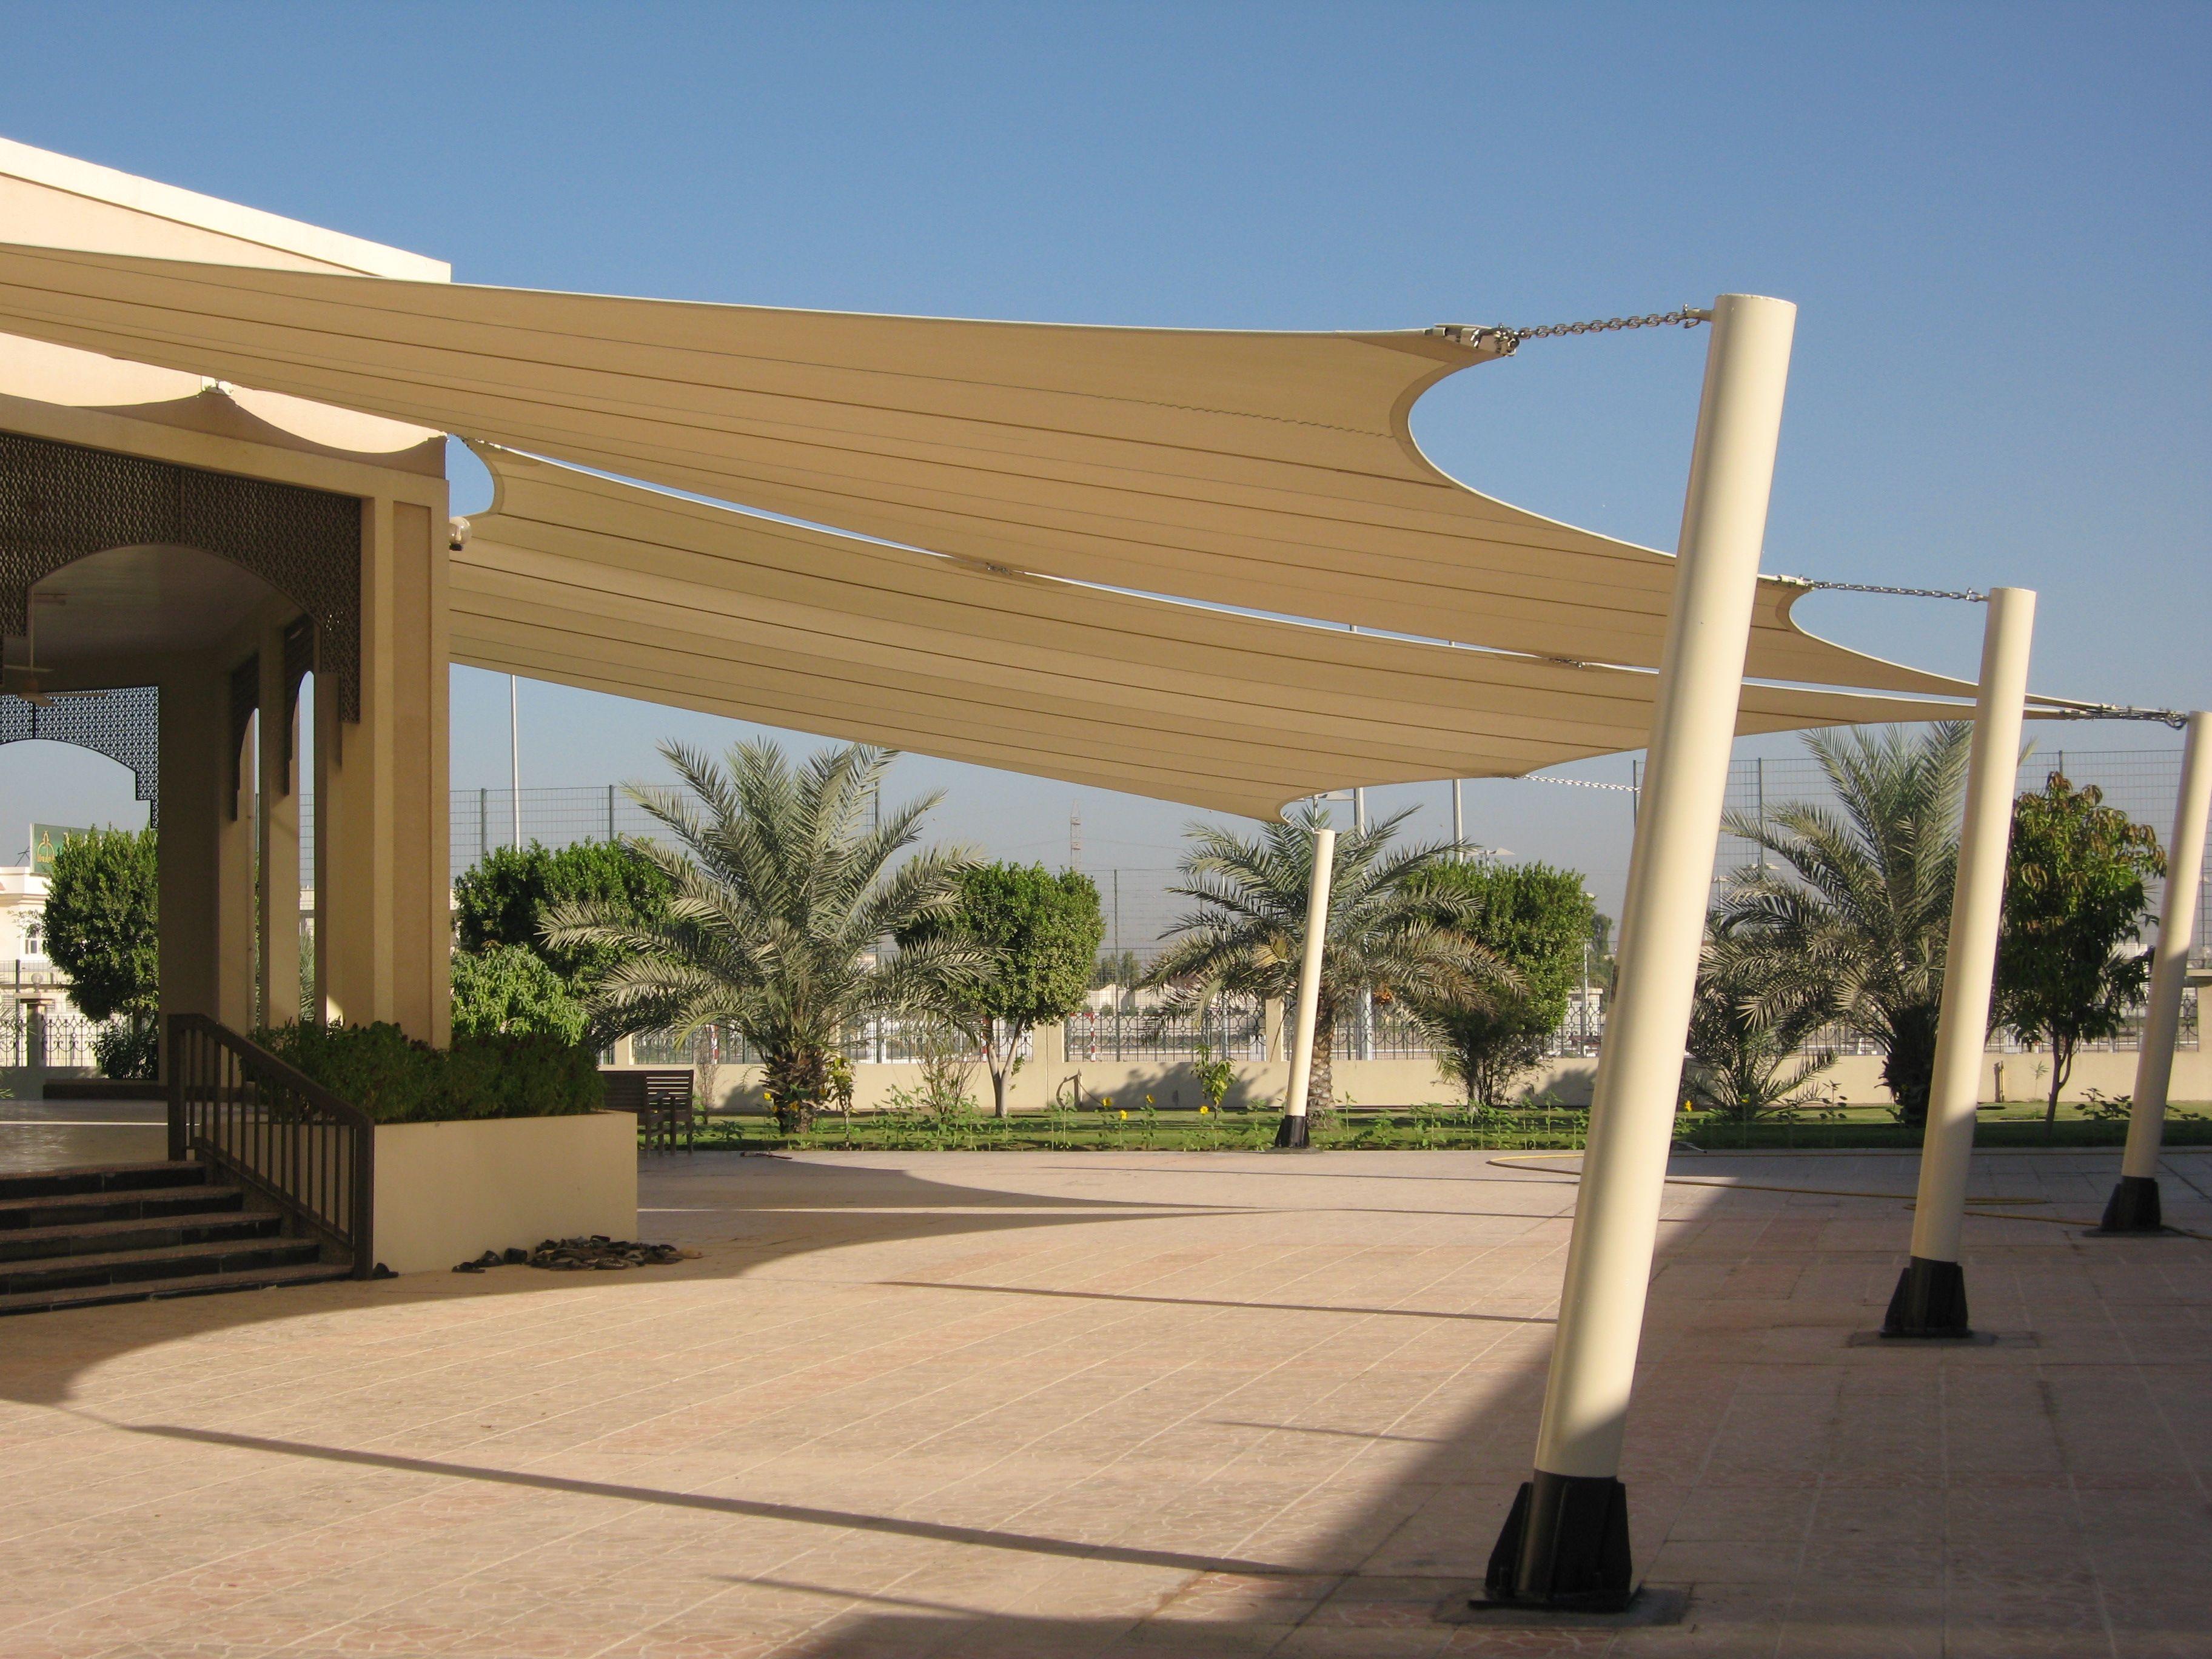 Pin By Faisal Yousufi On Shades Shades Shade Structure Carport Shade